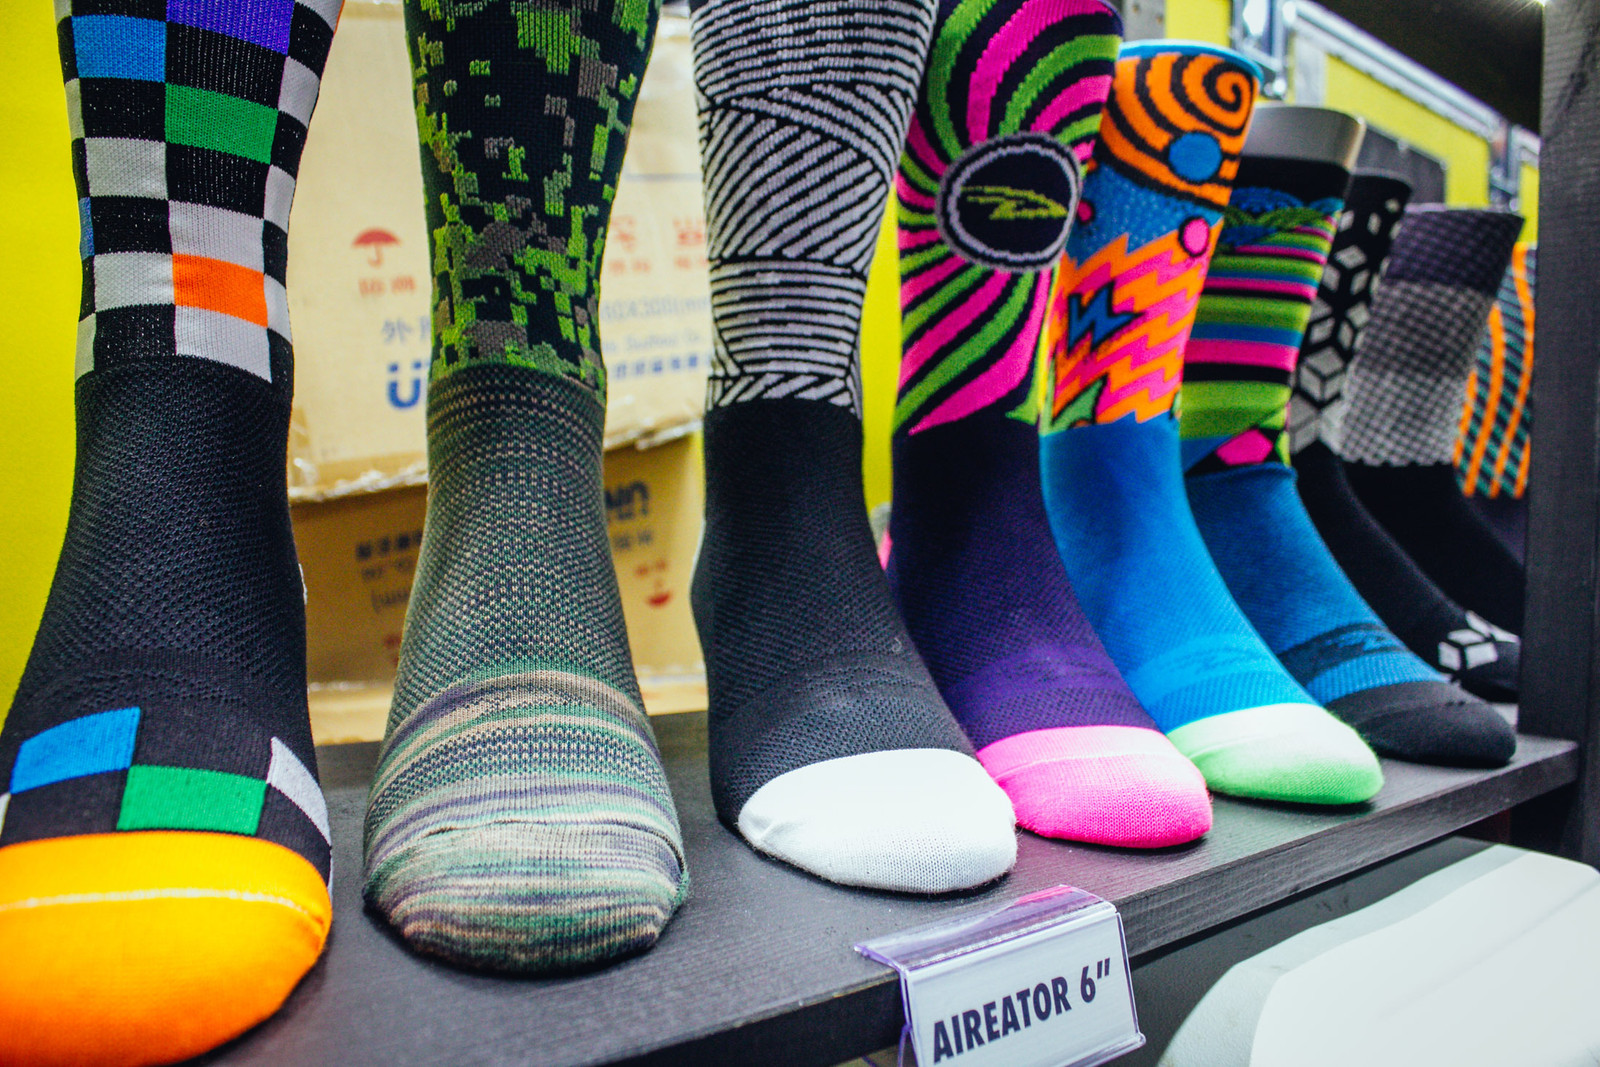 DeFeet Socks Made from Bottles - INTERBIKE - 2017 Women's Mountain Bike Gear - Mountain Biking Pictures - Vital MTB